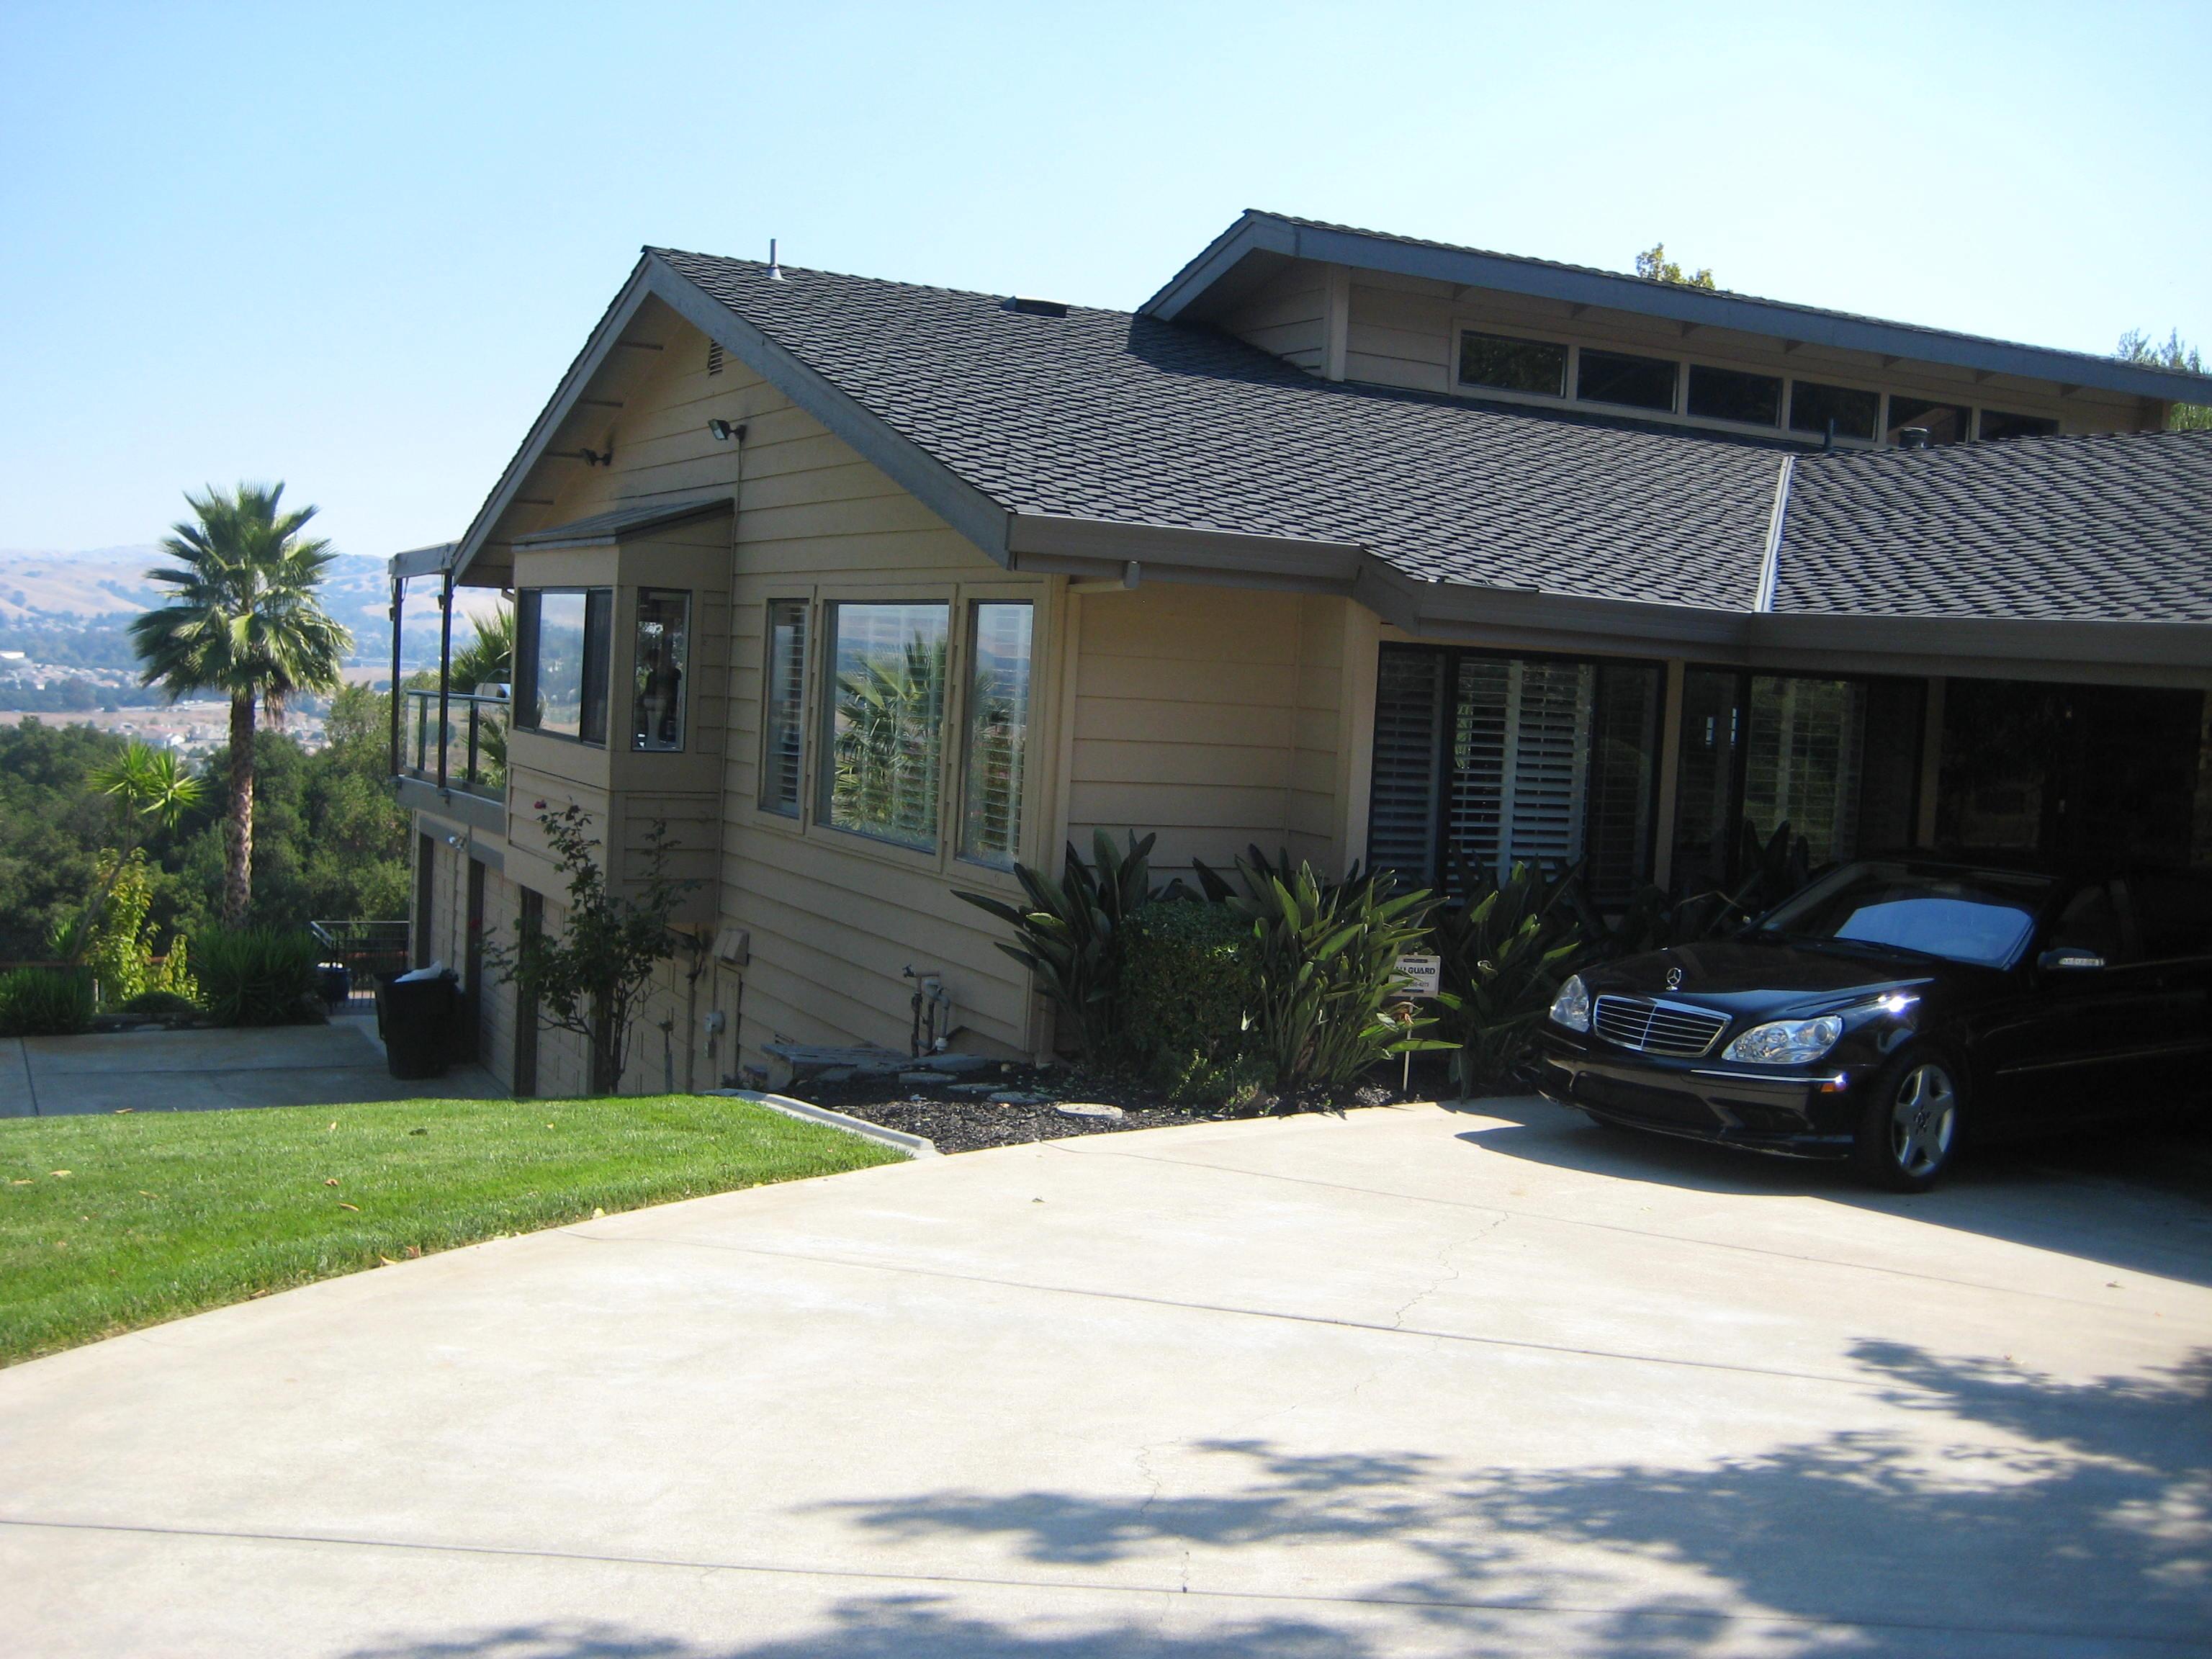 Homes For sale in Pleasanton